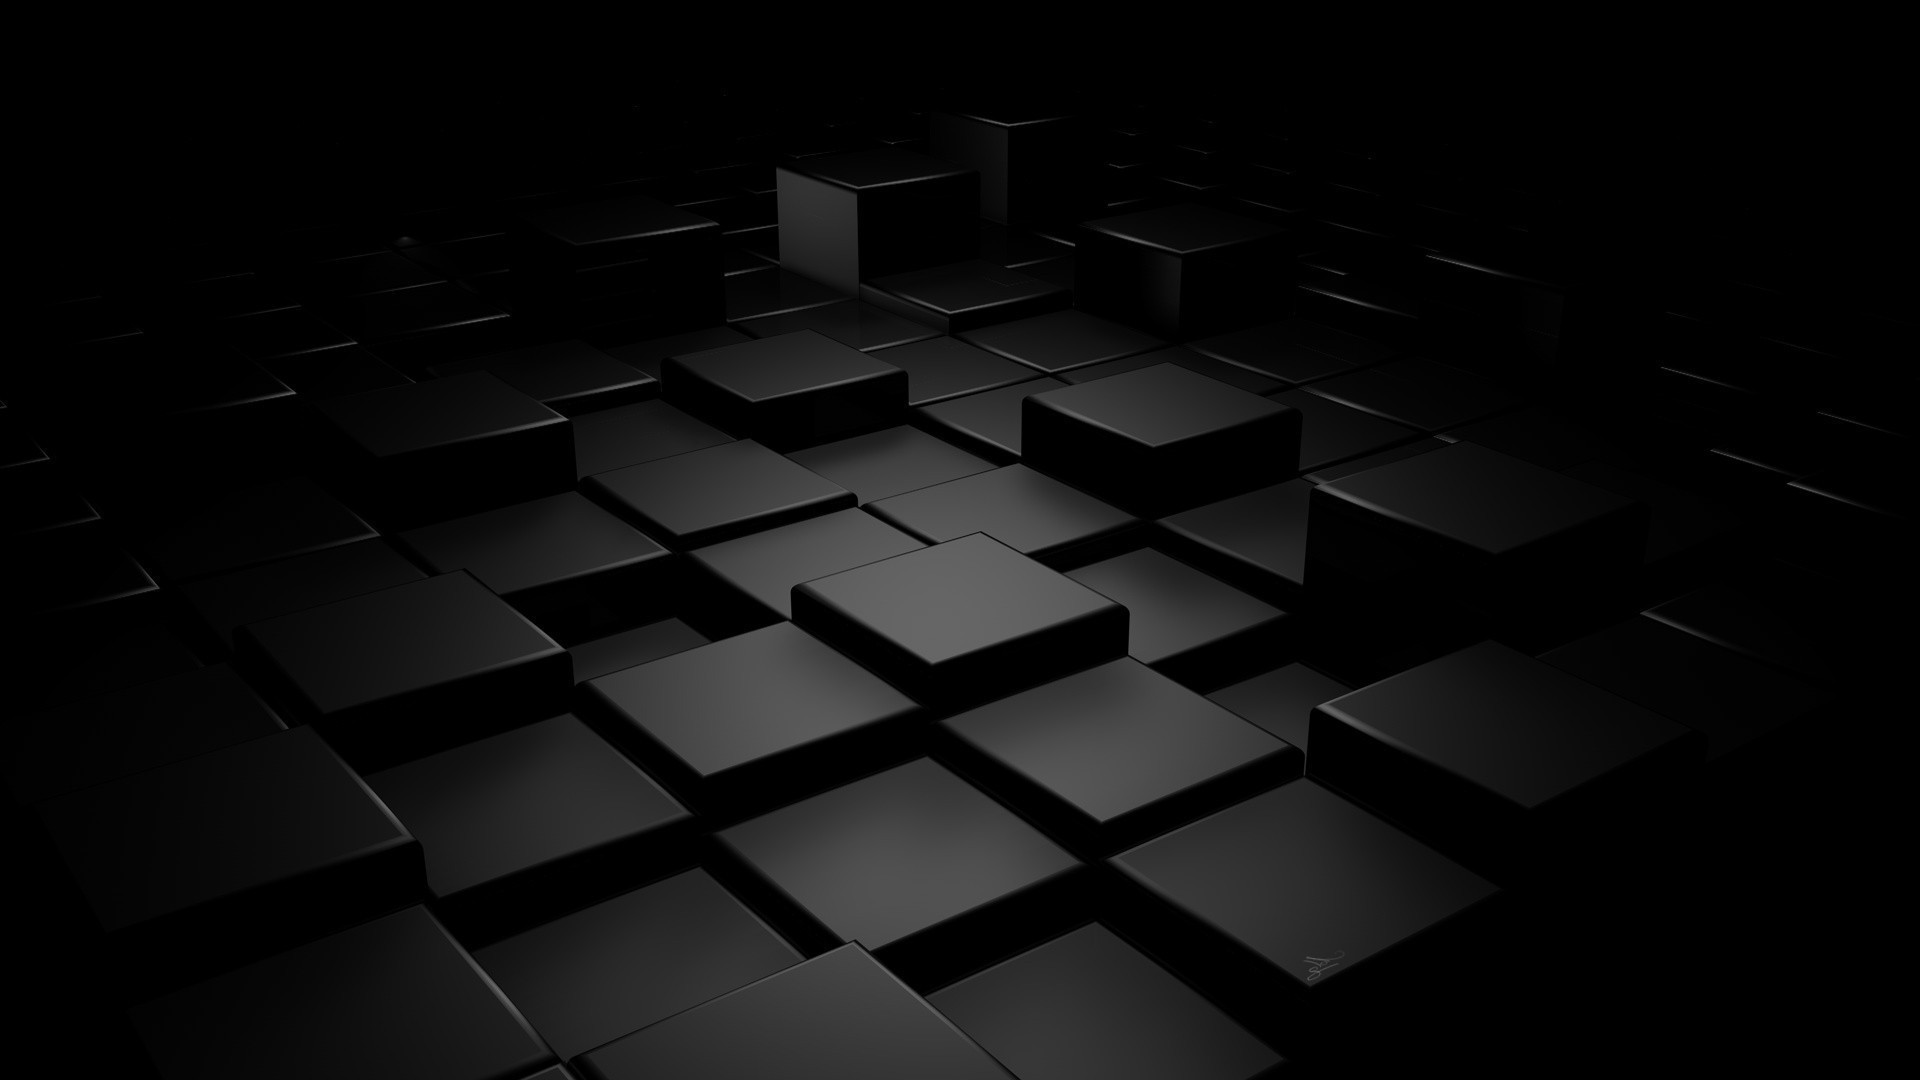 … black wallpaper 7 …